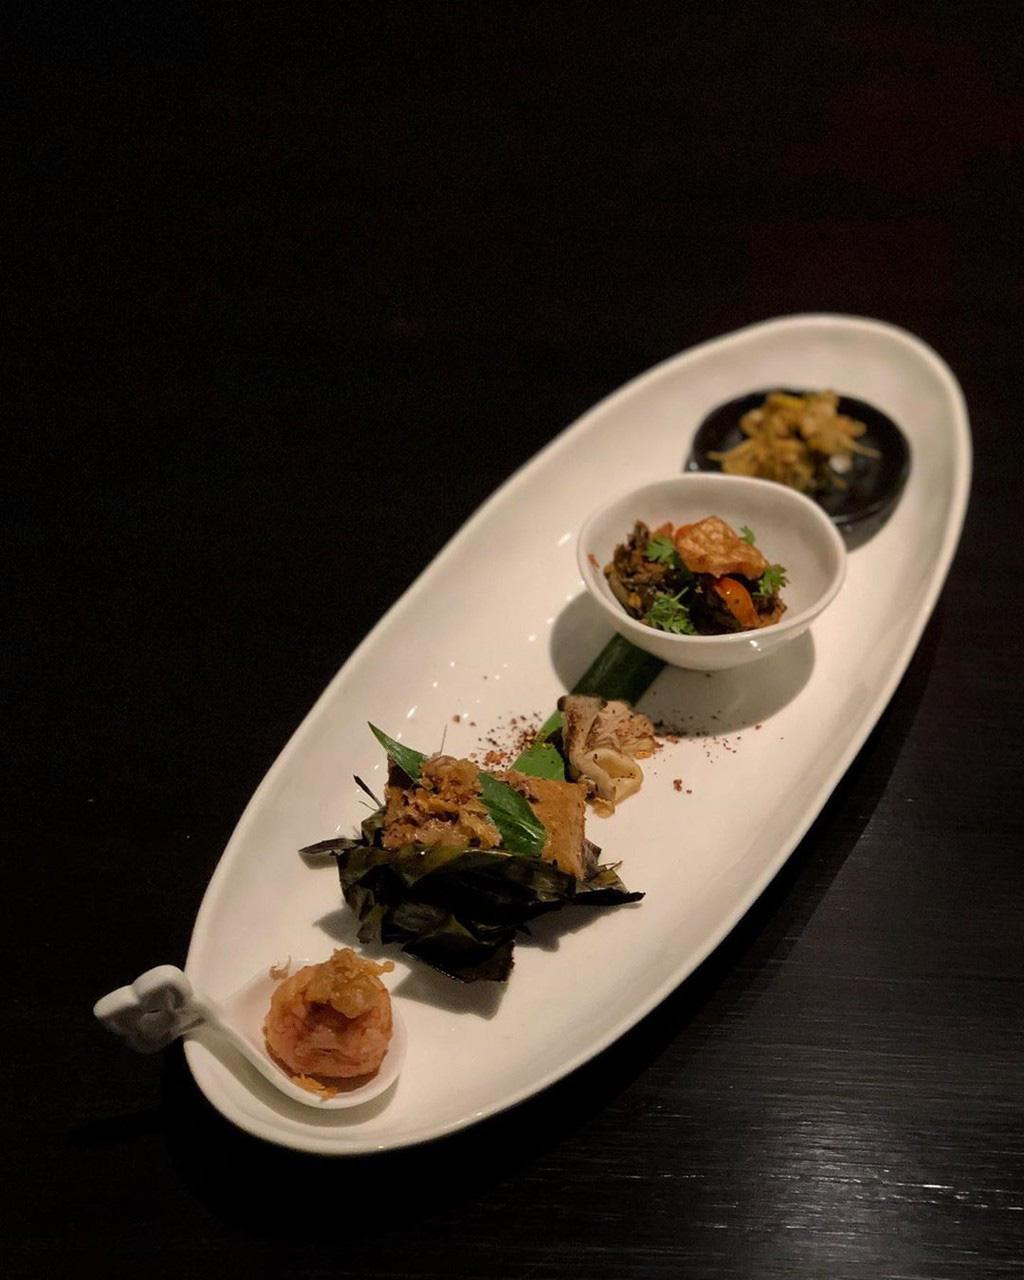 4 nha hang co tien chua chac duoc an o Thai Lan hinh anh 12